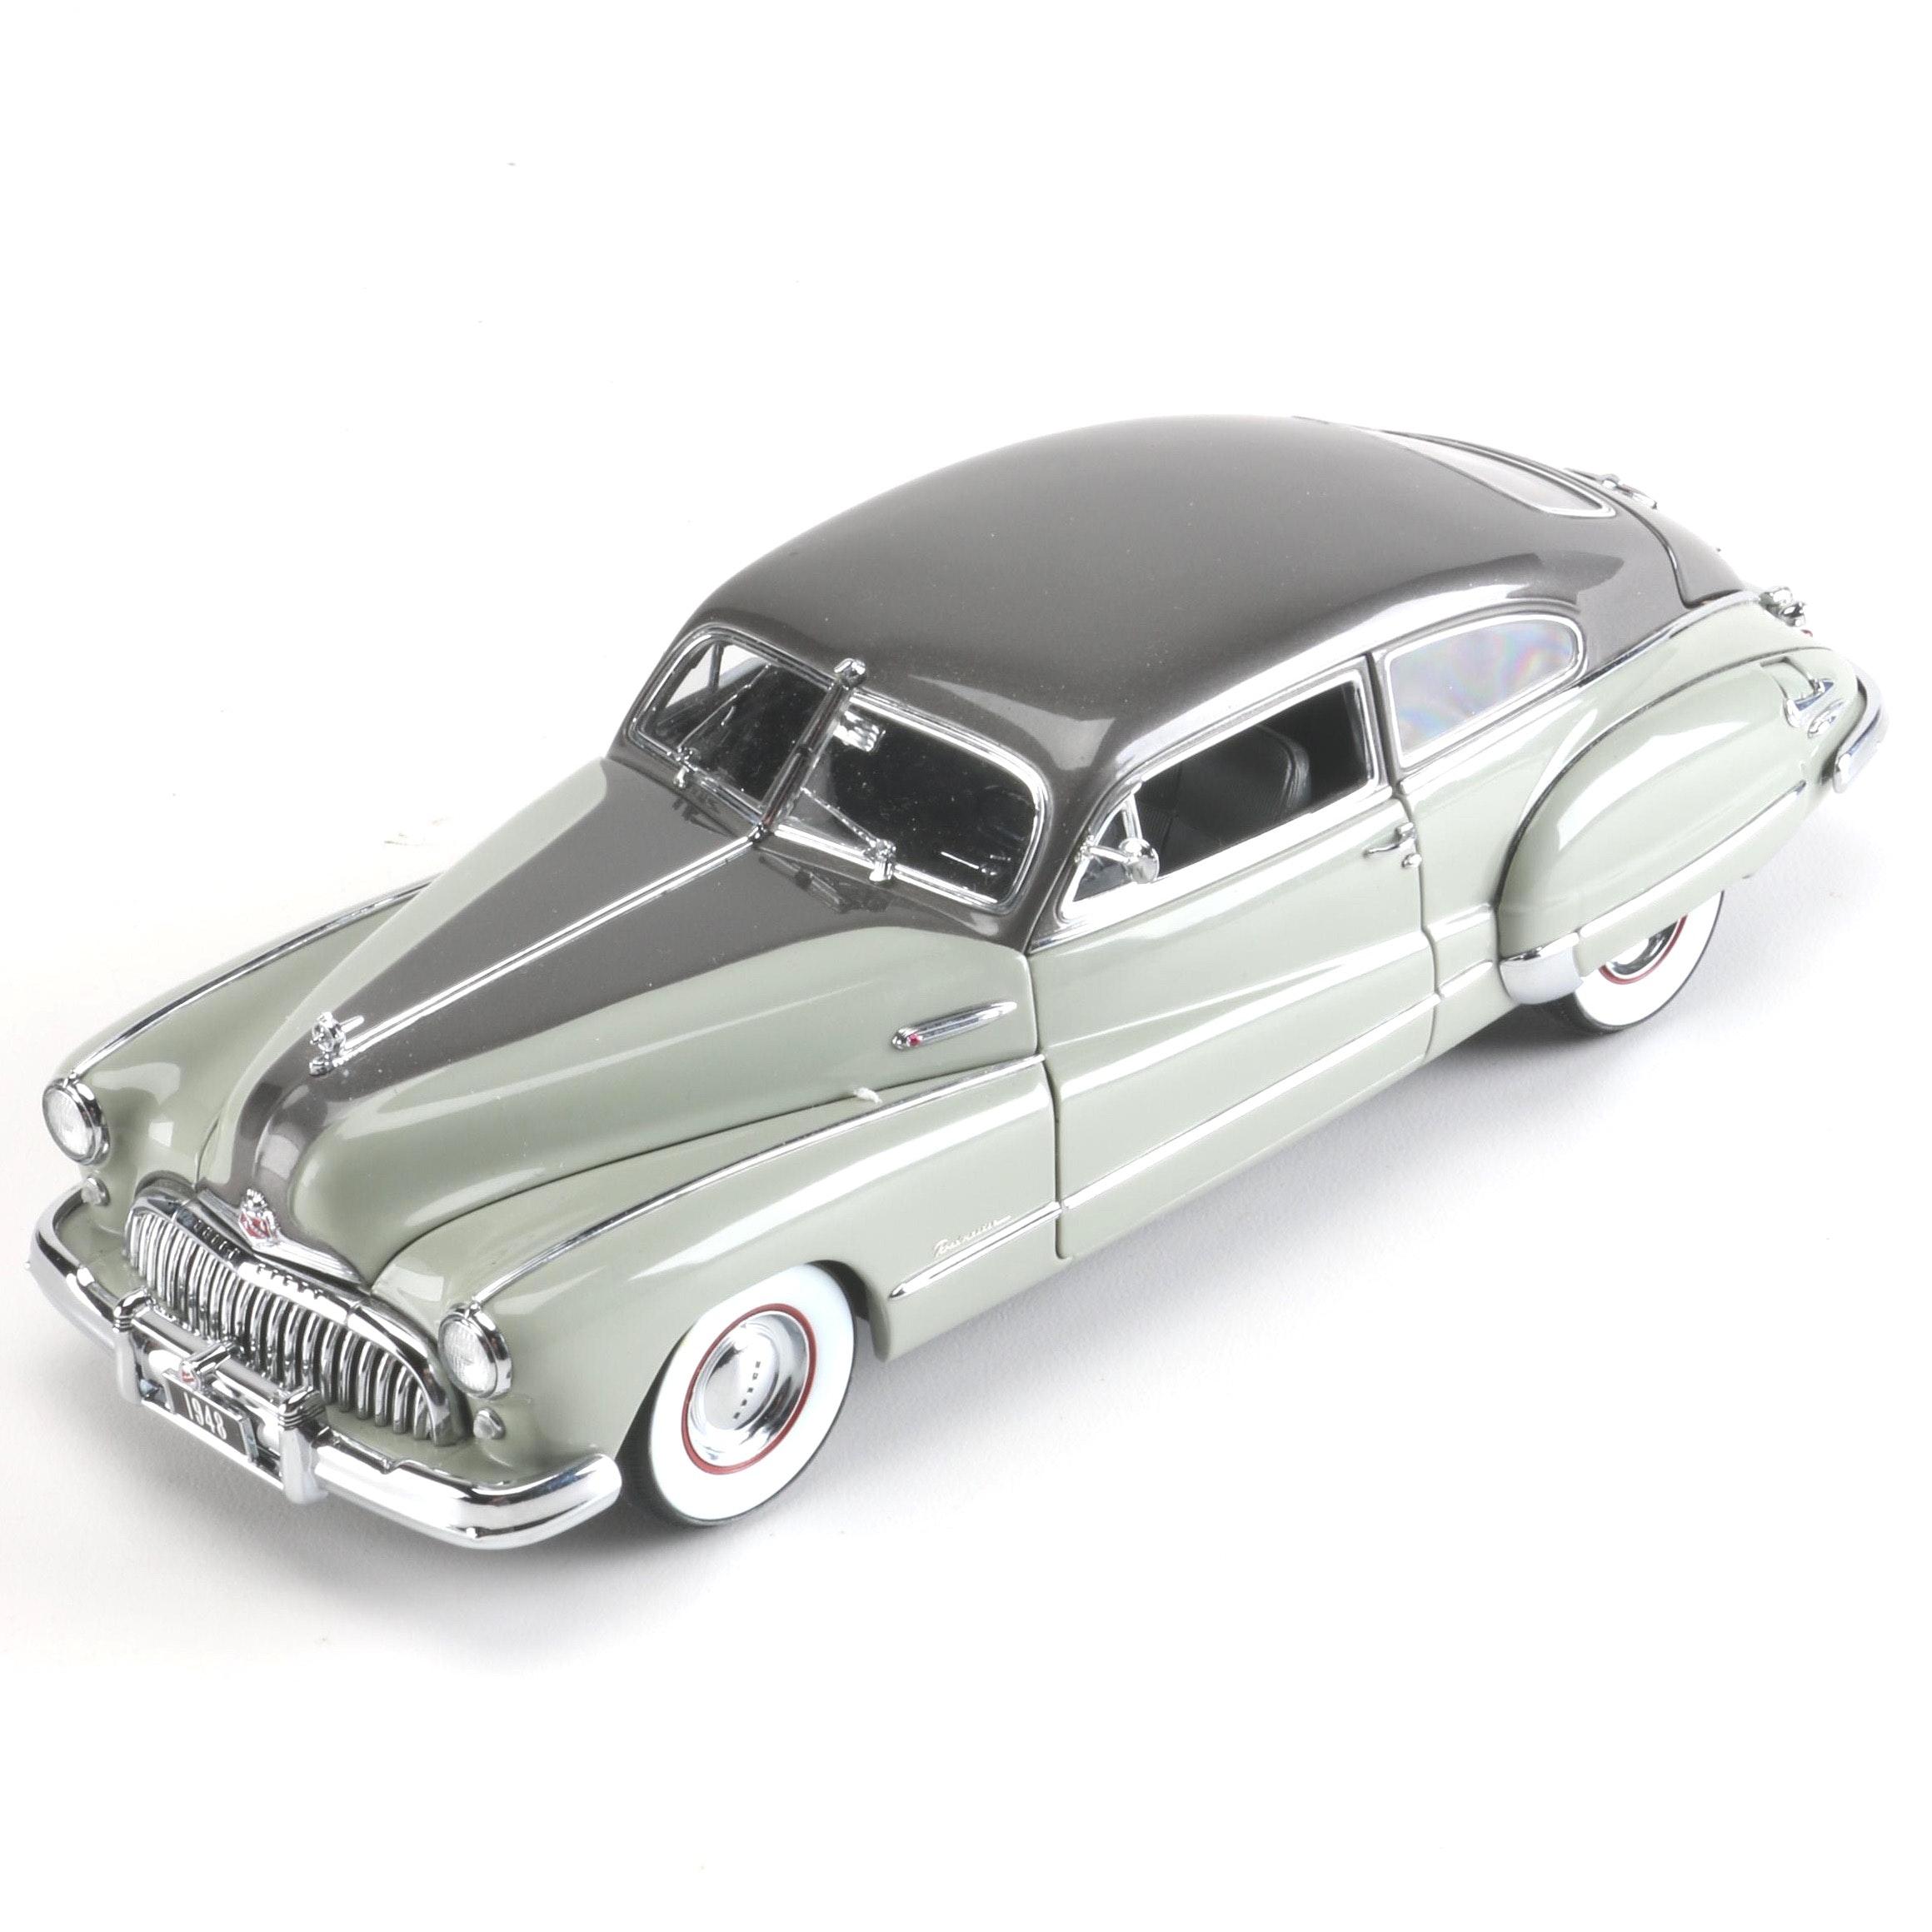 1948 Buick Roadmaster by The Danbury Mint